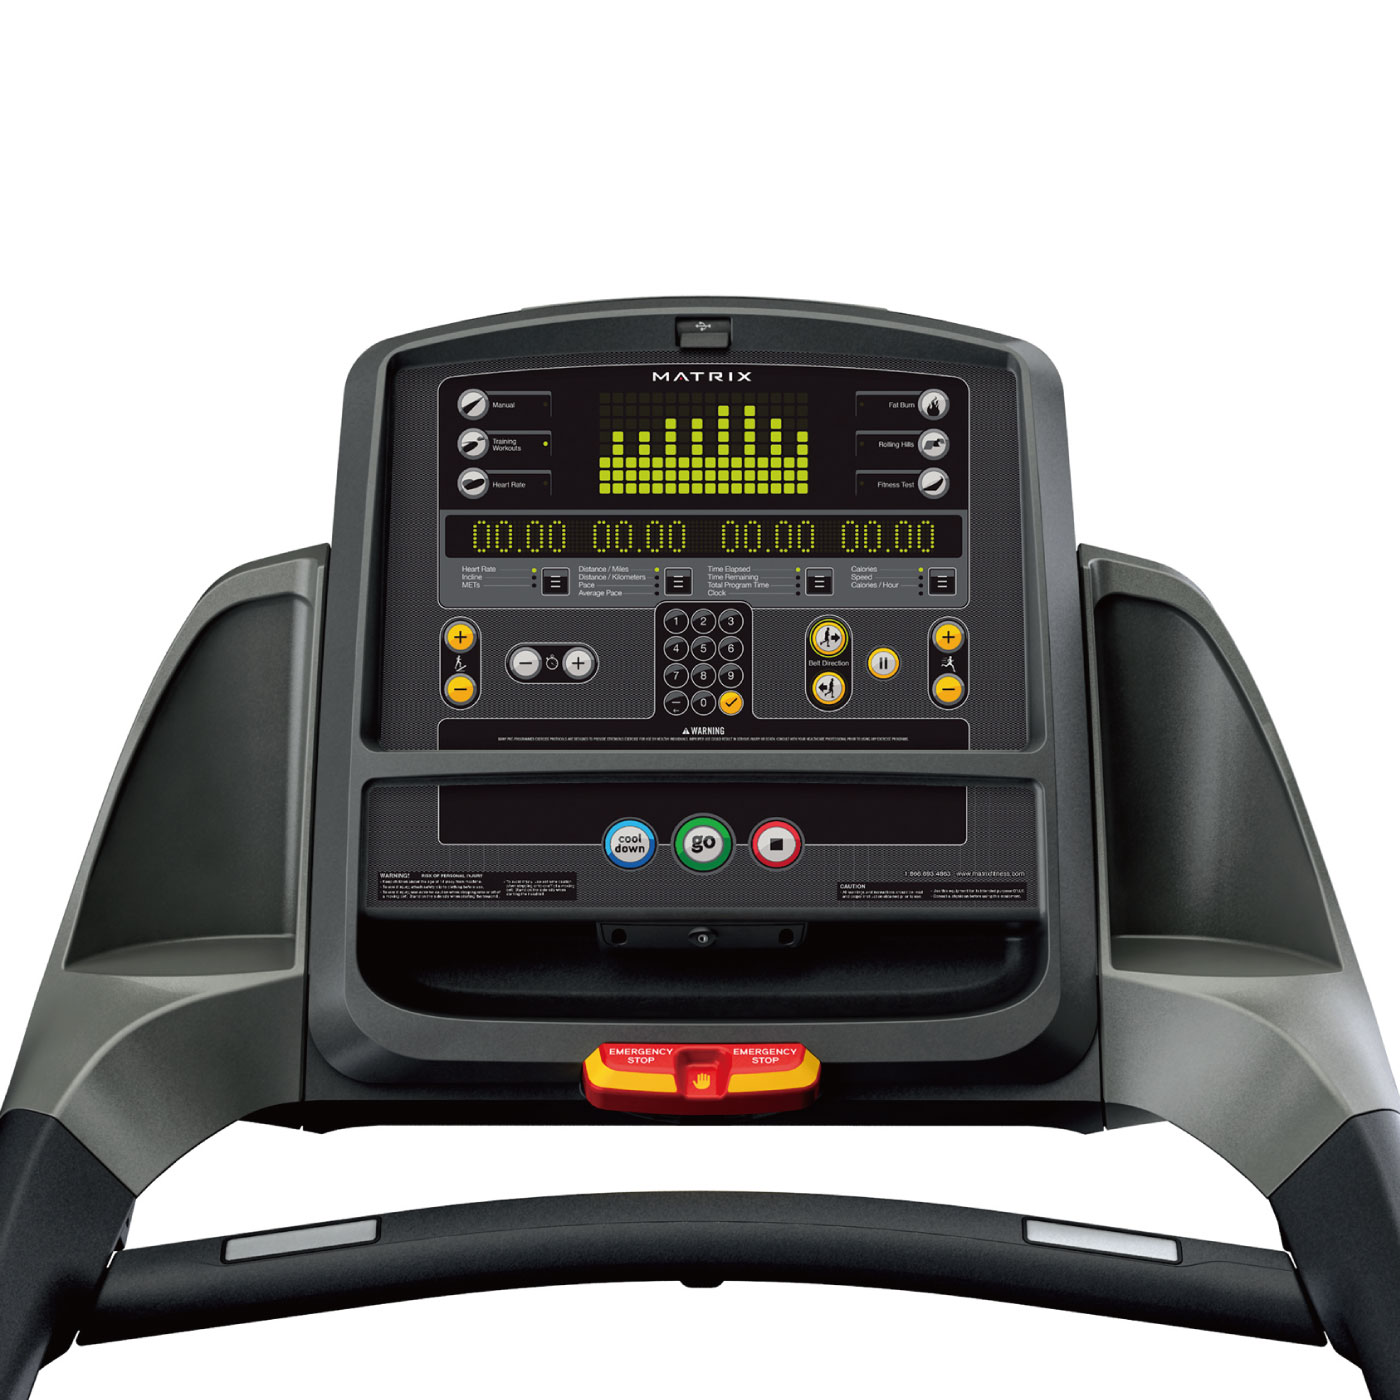 T3xm/業務用ランニングマシン〈業務用MATRIX〉《ジョンソンヘルステック》